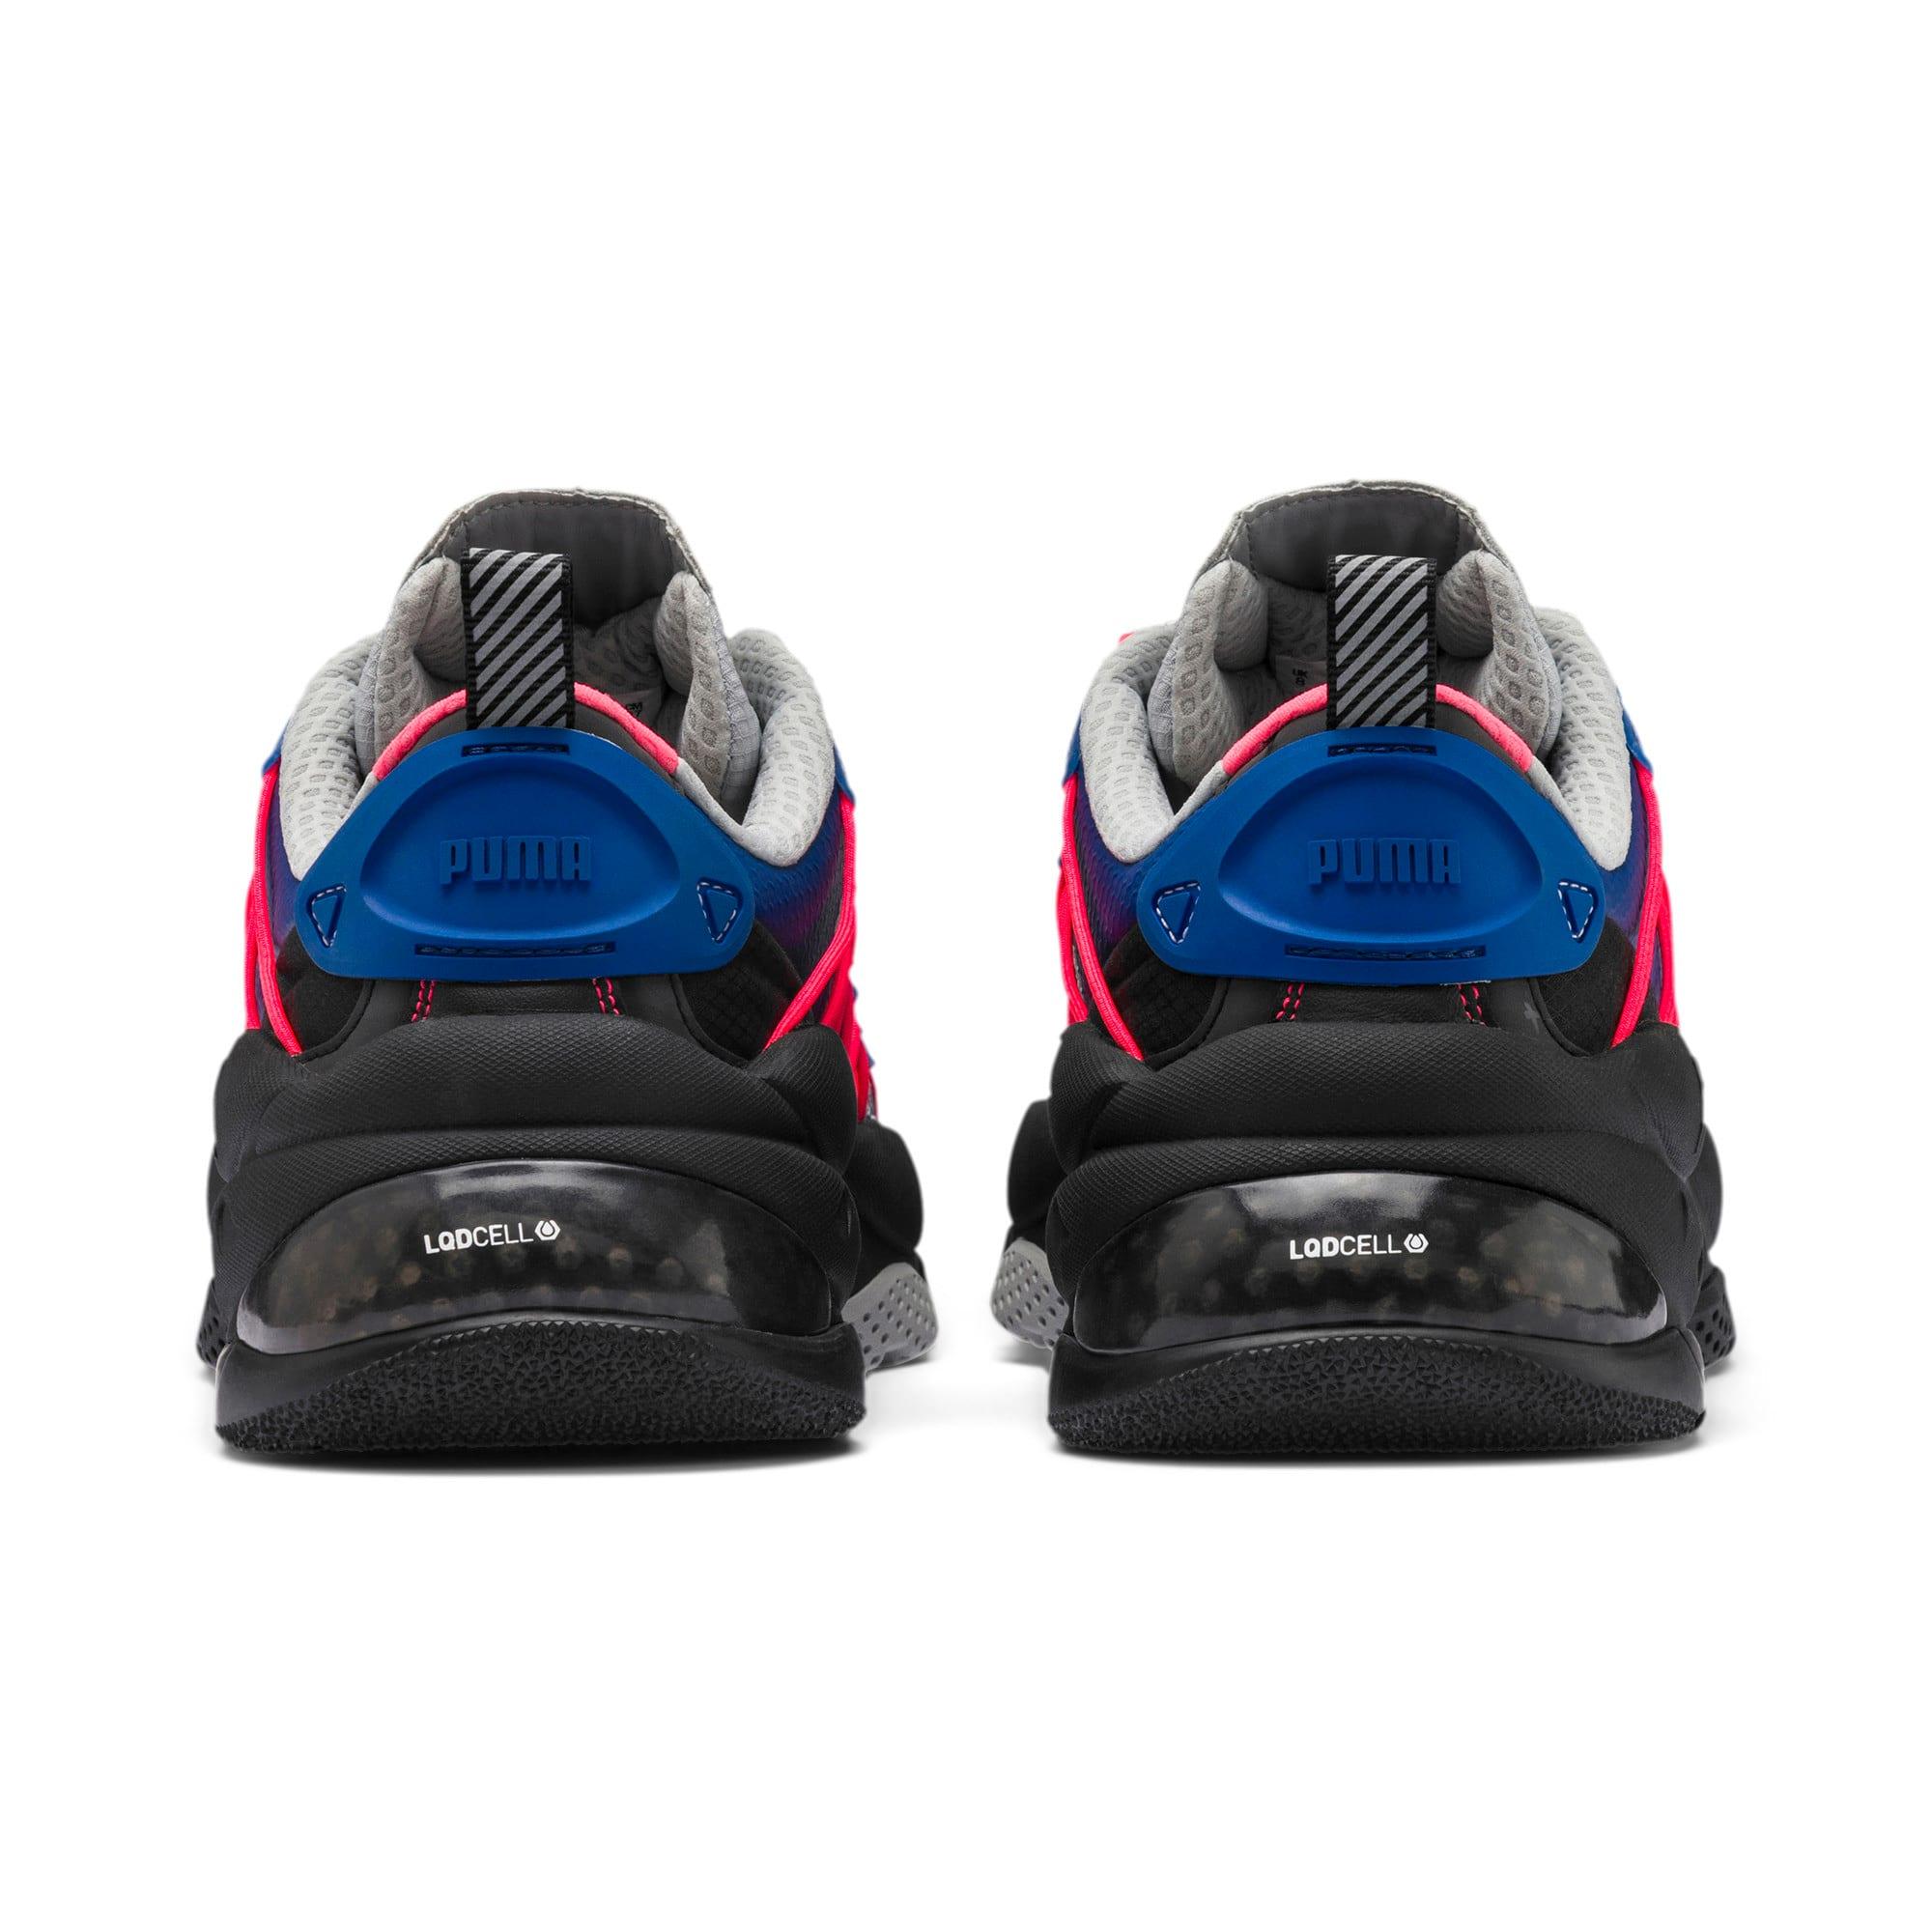 Thumbnail 3 of LQDCELL Omega Lab Sneaker, Puma Black-Galaxy Blue, medium